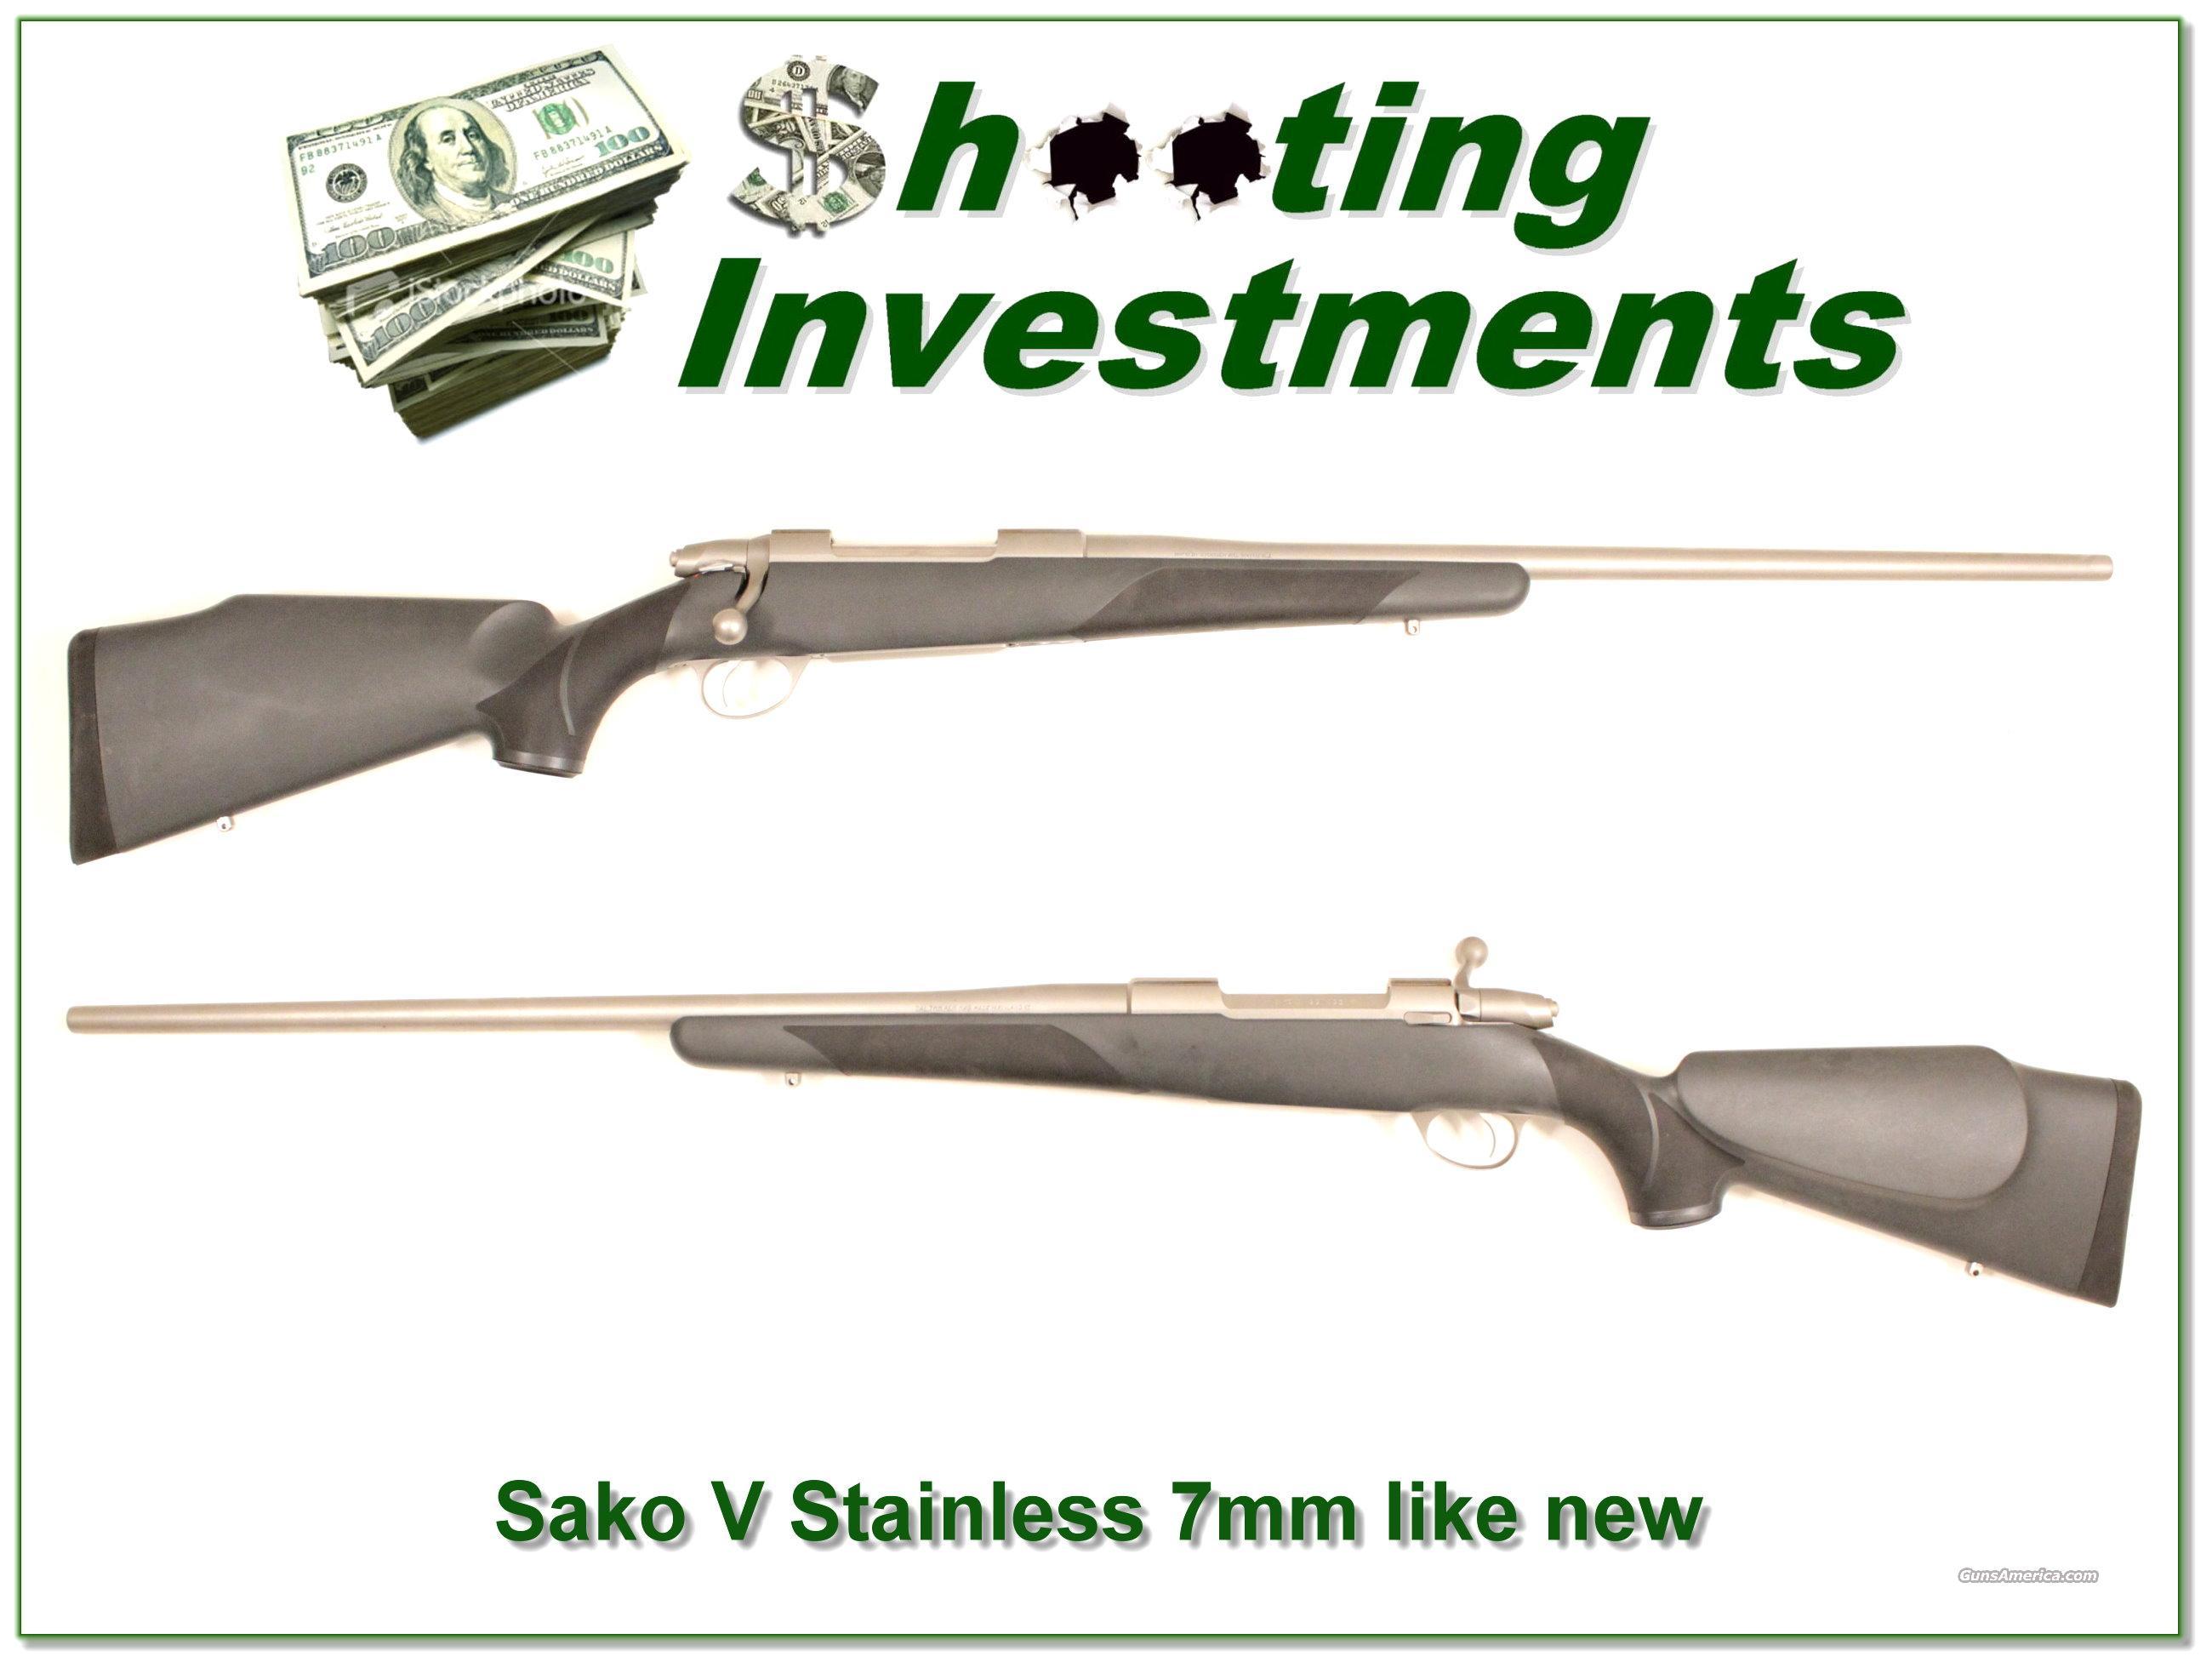 Sako V Stainless Steel 7mm Rem Mag  Guns > Rifles > Sako Rifles > Other Bolt Action